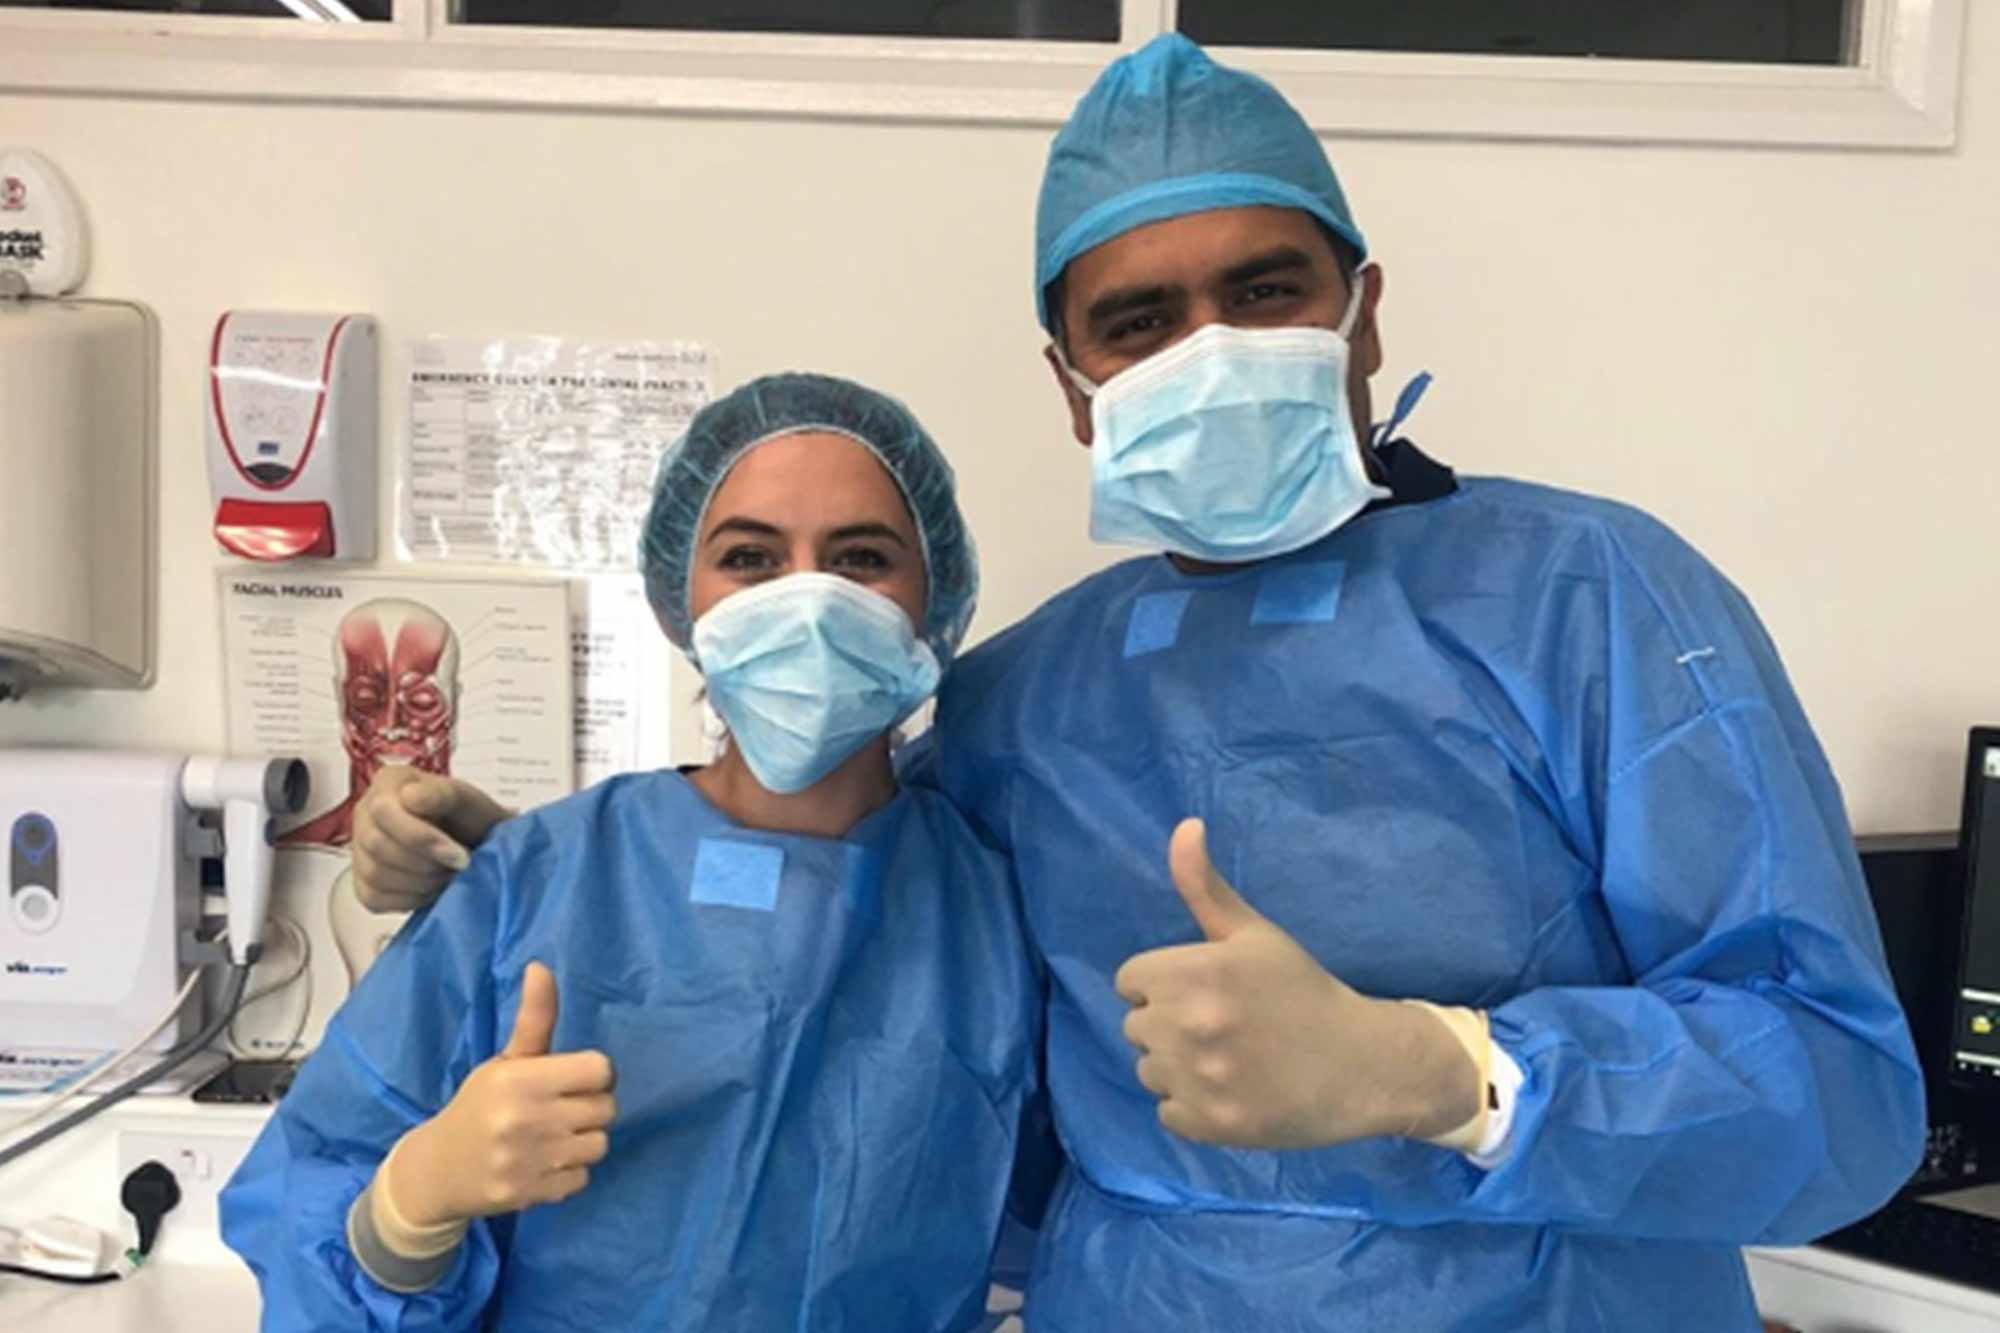 My journey into periodontology specialist training